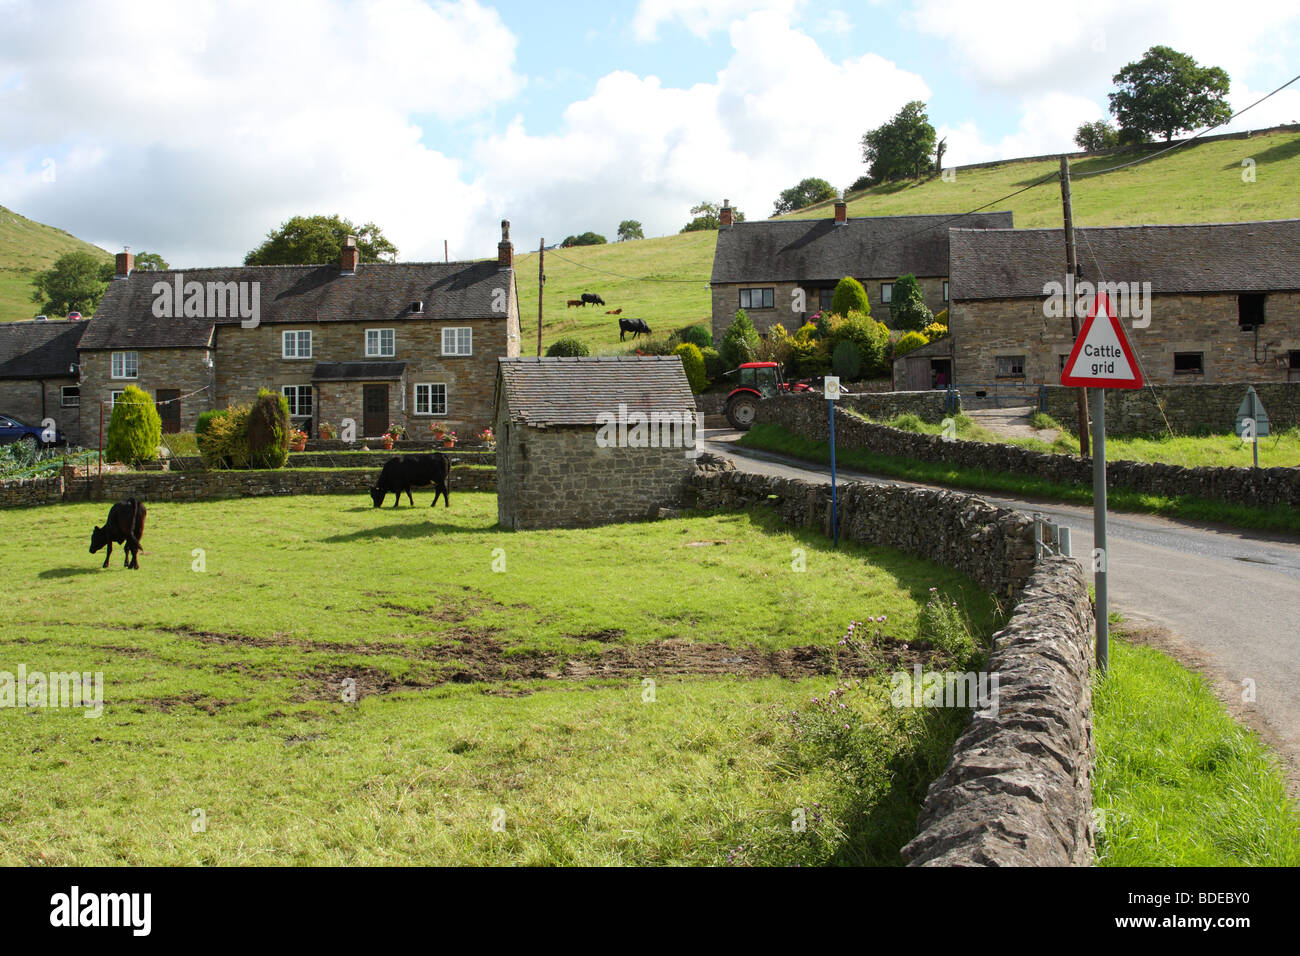 A farm in the Peak District National Park, Derbyshire, England, U.K. - Stock Image